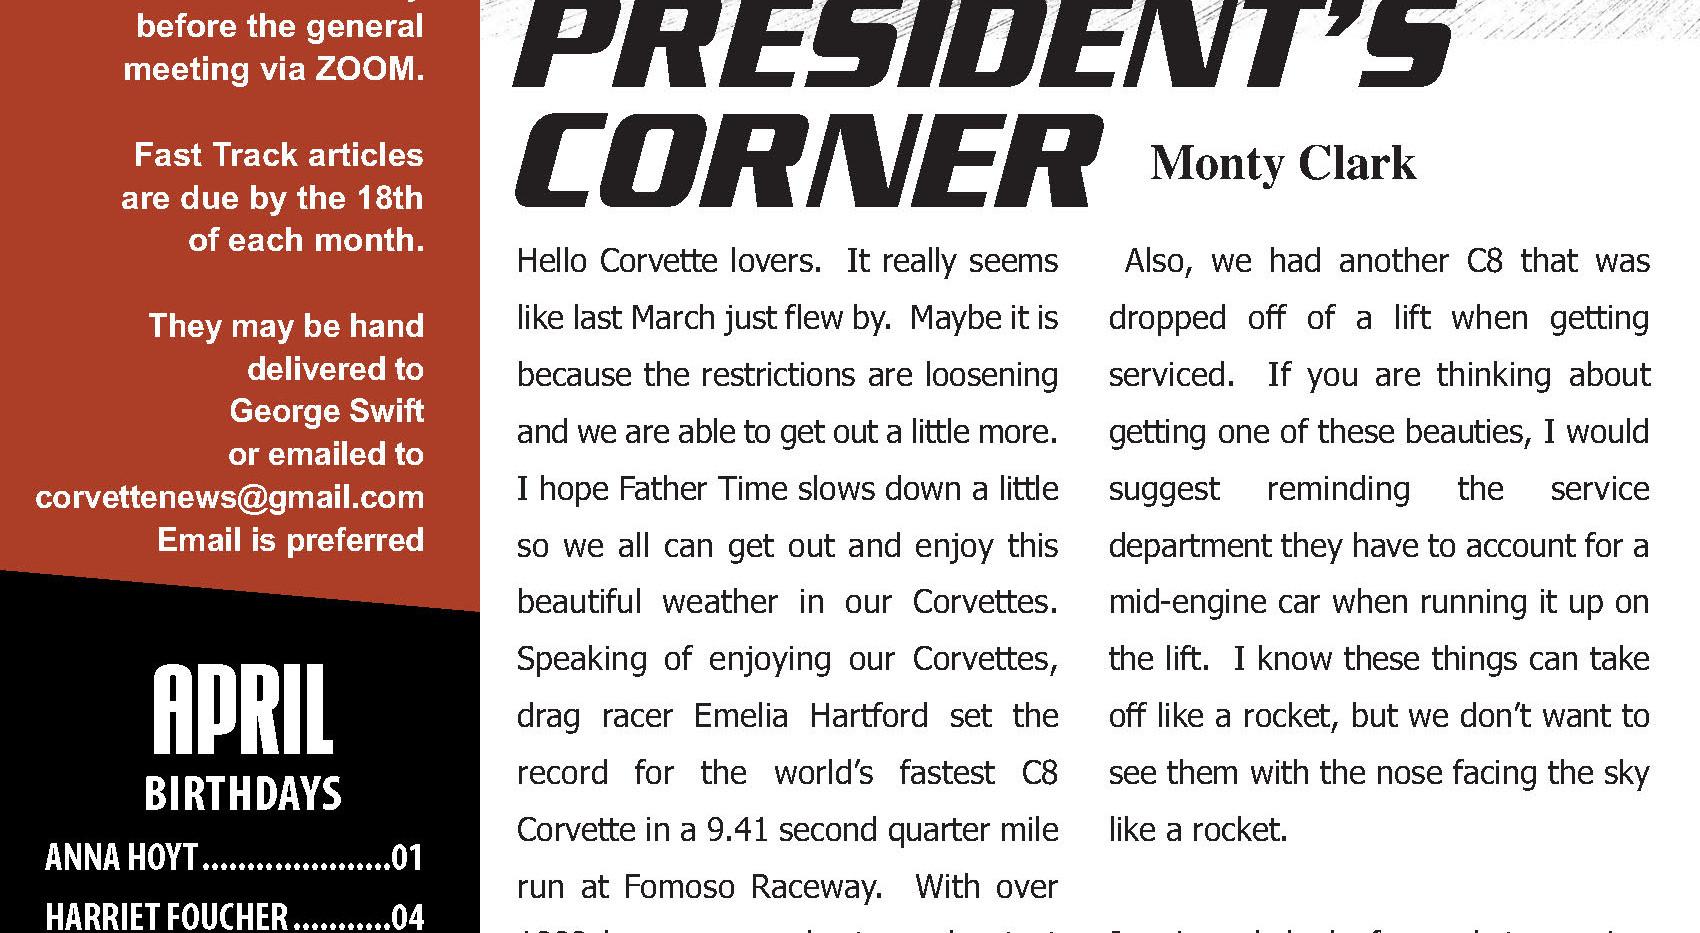 corvettes west news 421_Page_2.jpg